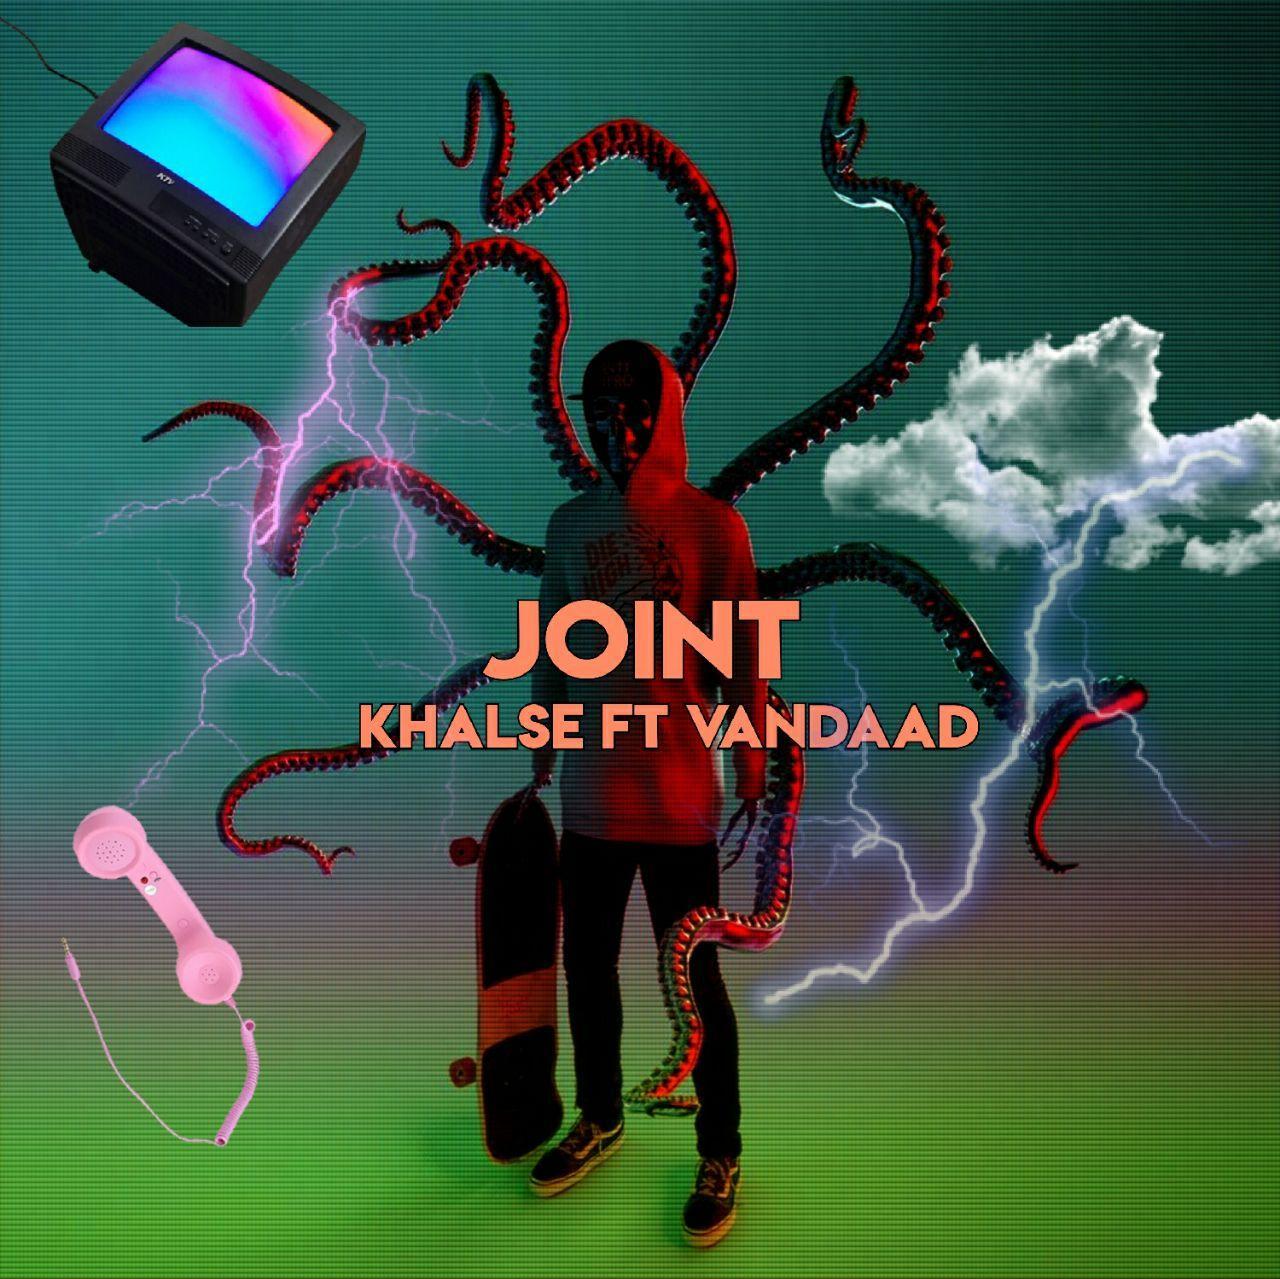 Khalse Ft Vandaad – Joint